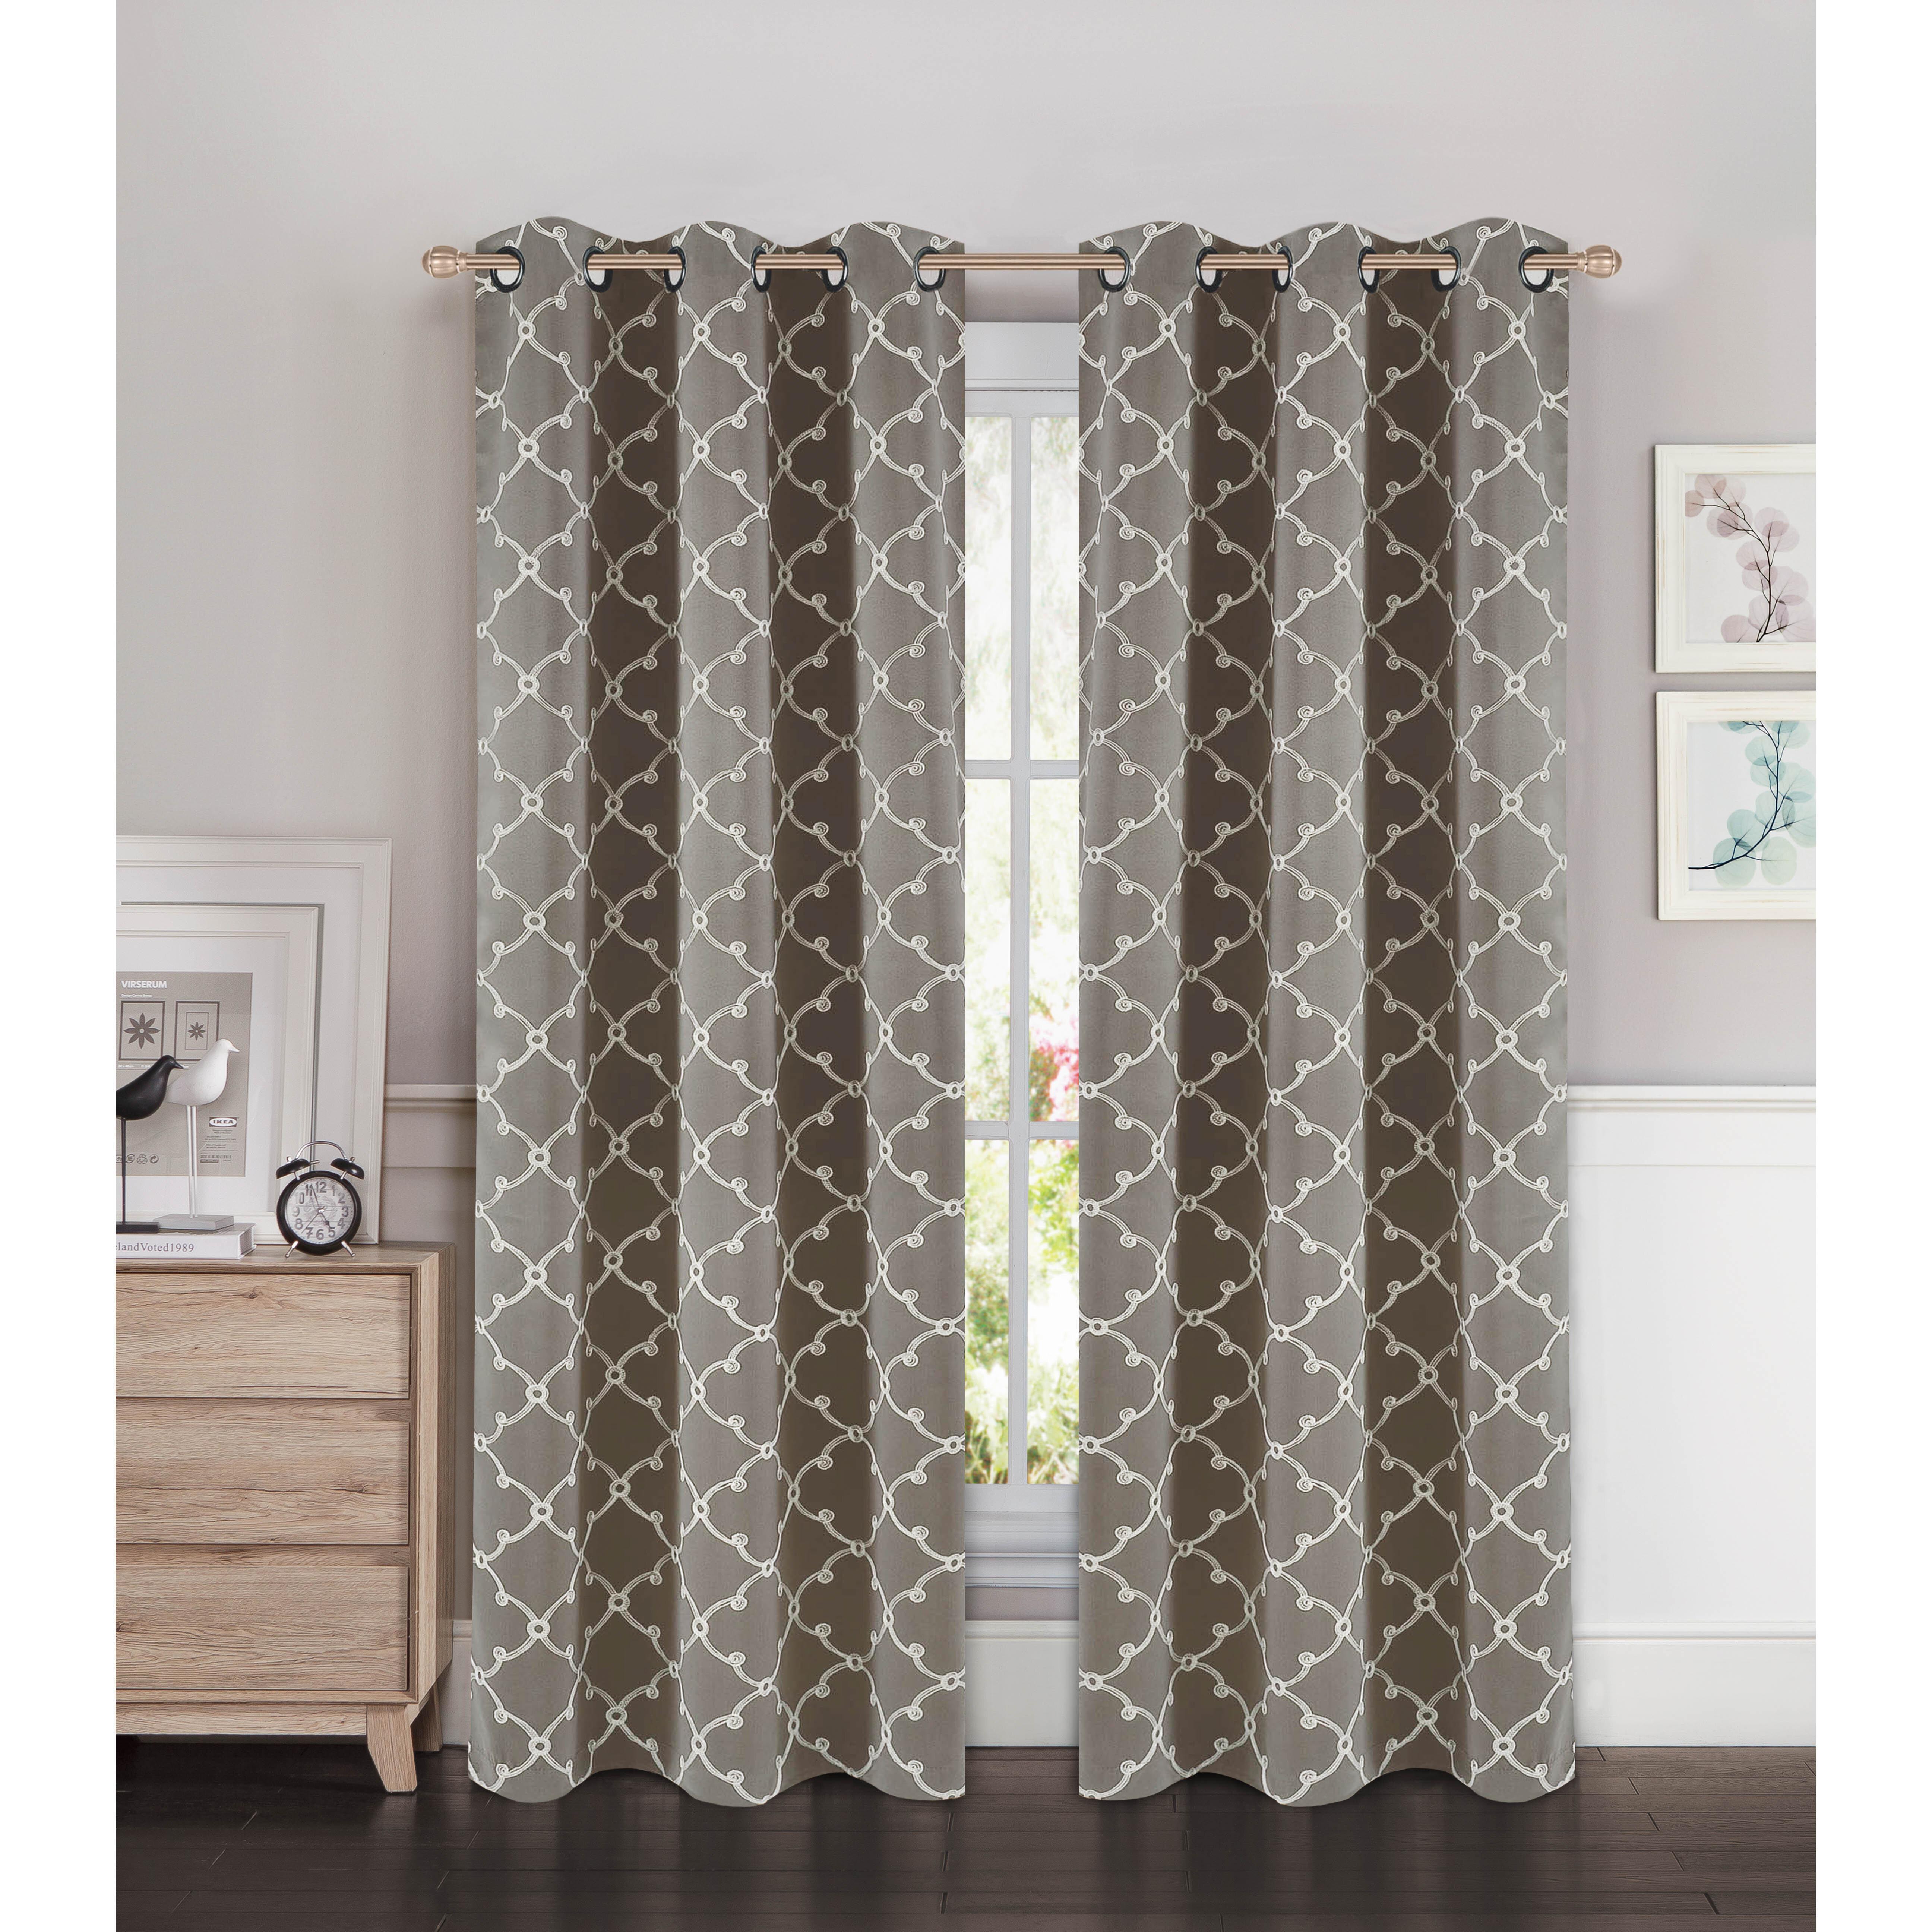 Geometric Winston Porter Curtains Drapes You Ll Love In 2021 Wayfair